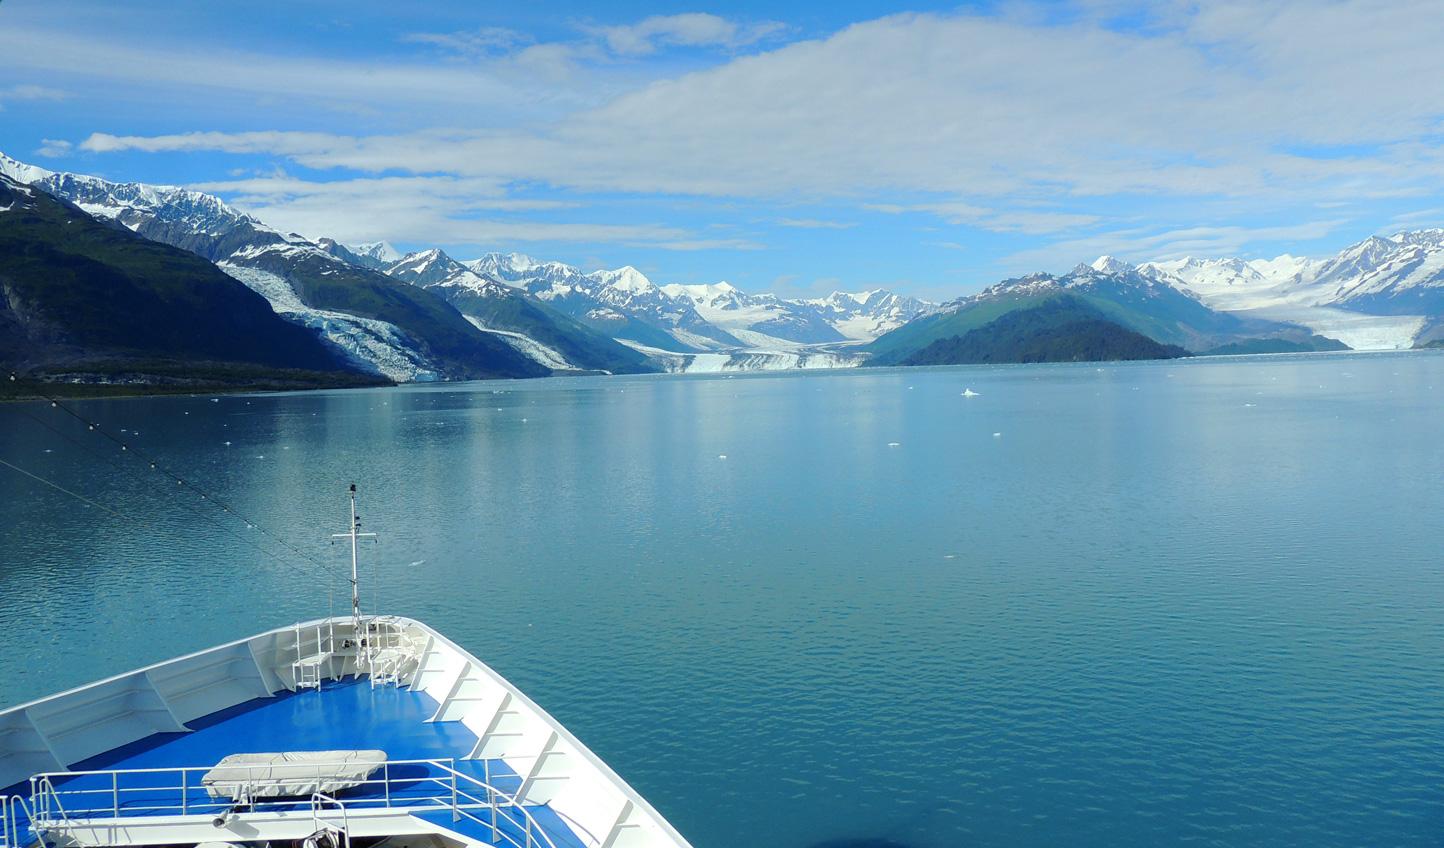 Set sail on Prince William Sound